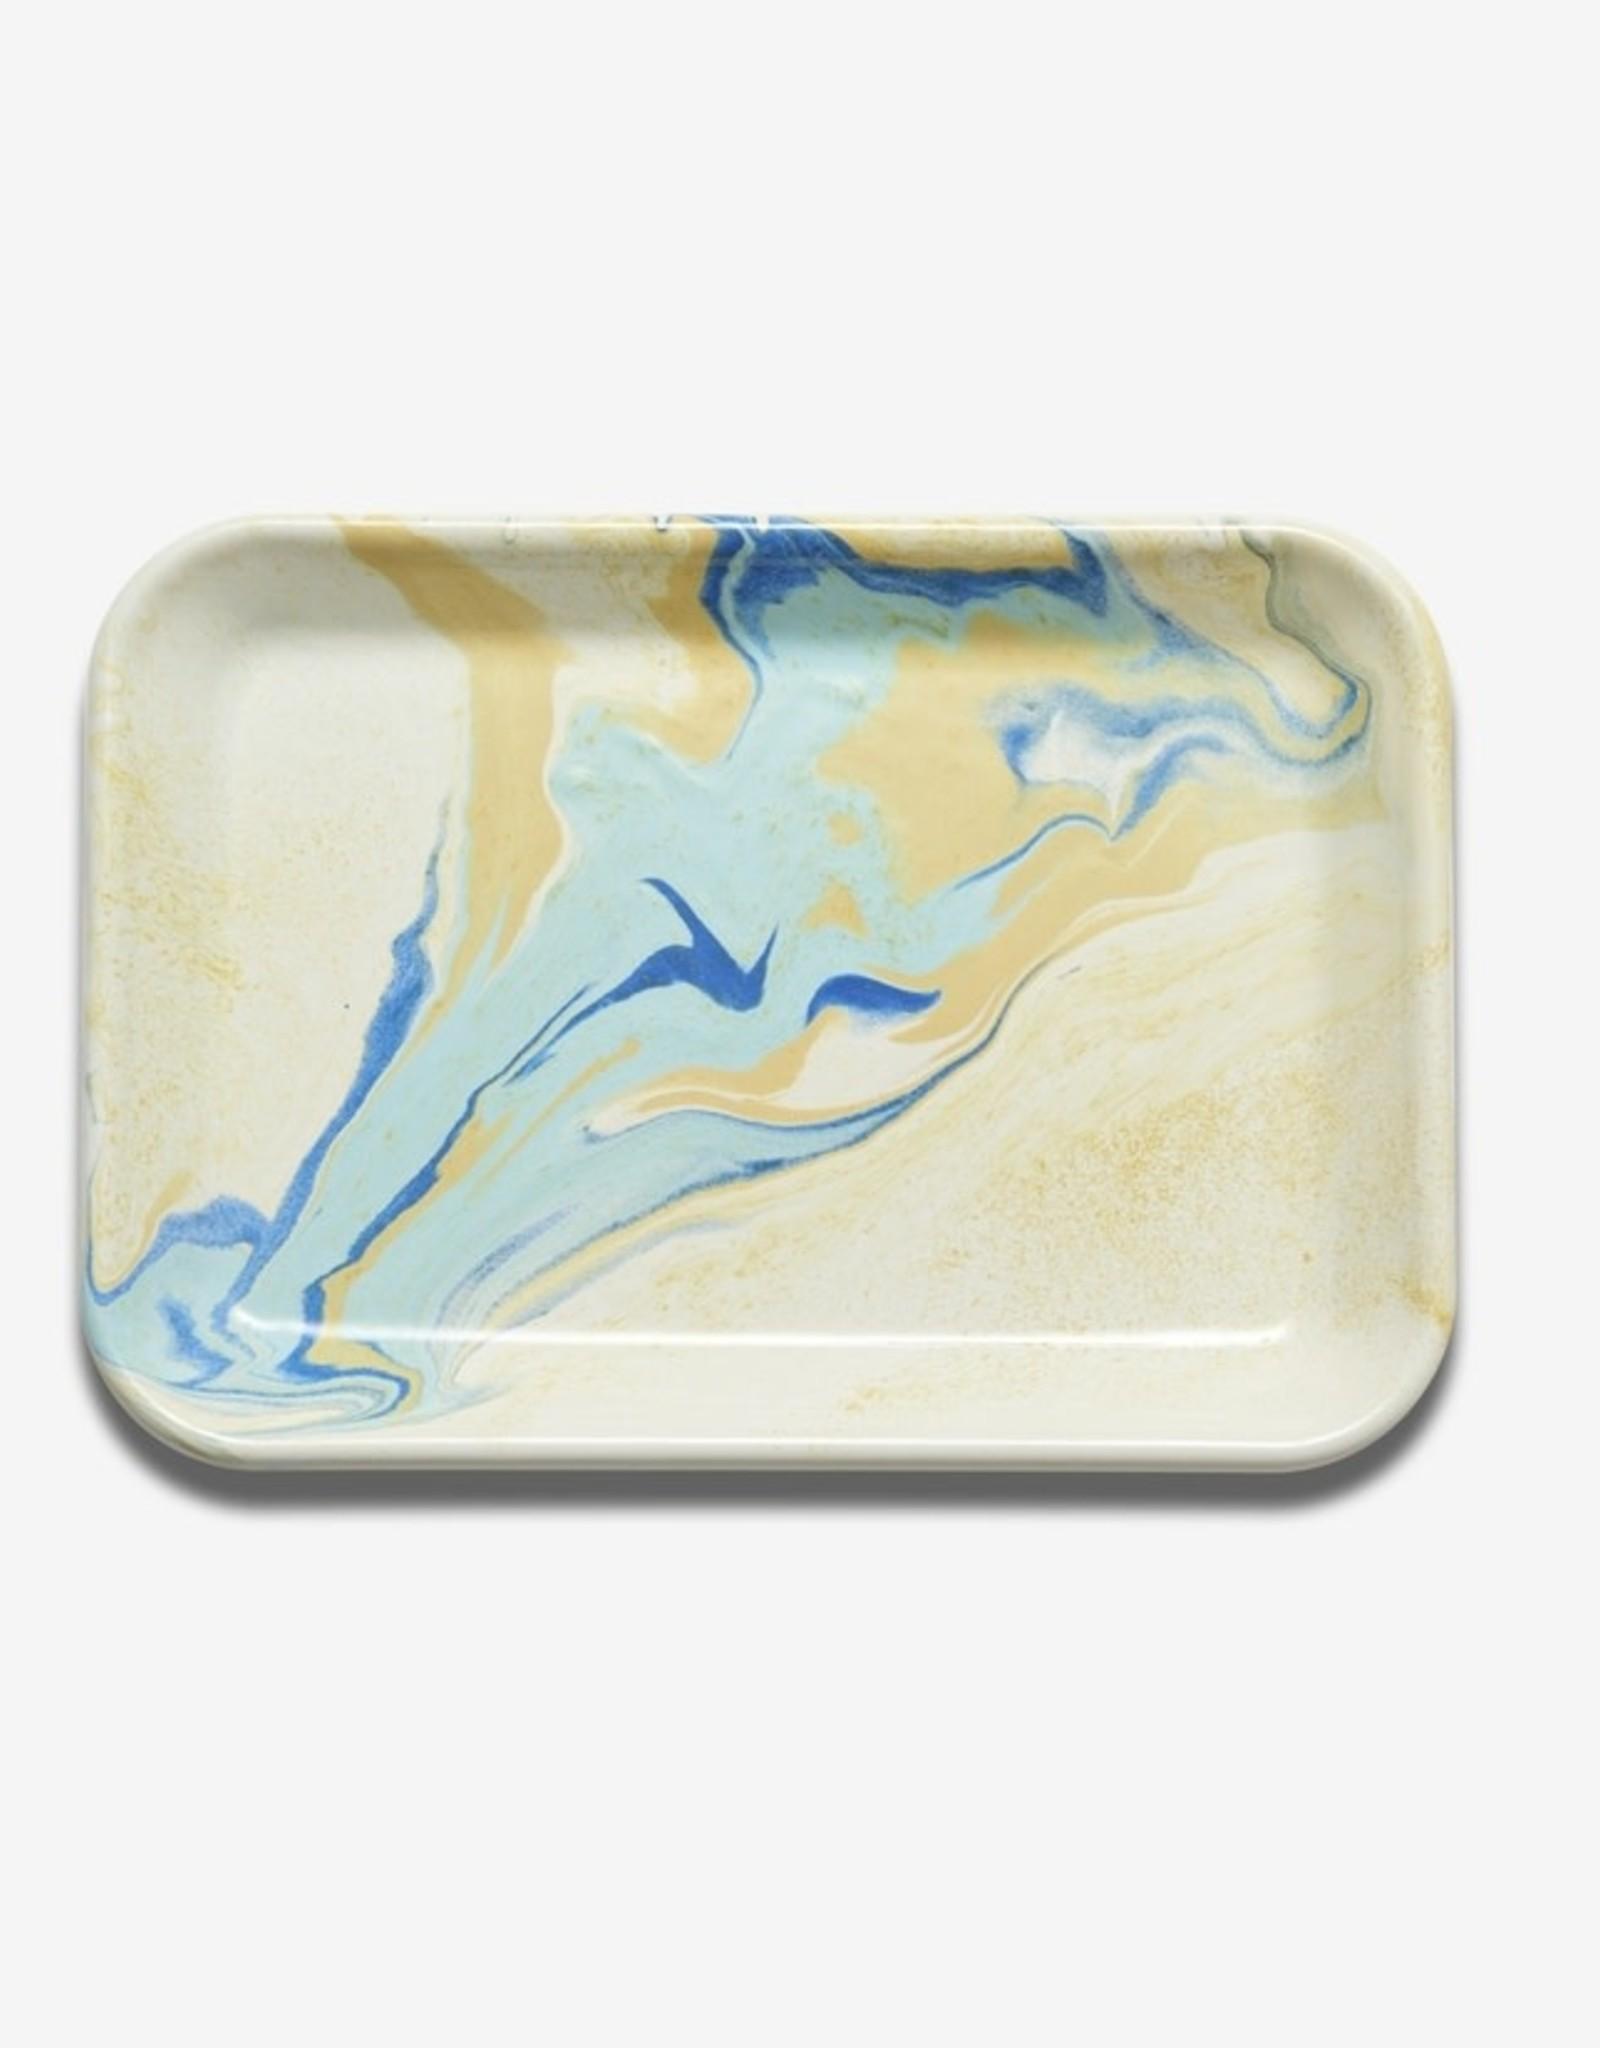 Bornn Bornn   Enamel Tray - Lemon Cream